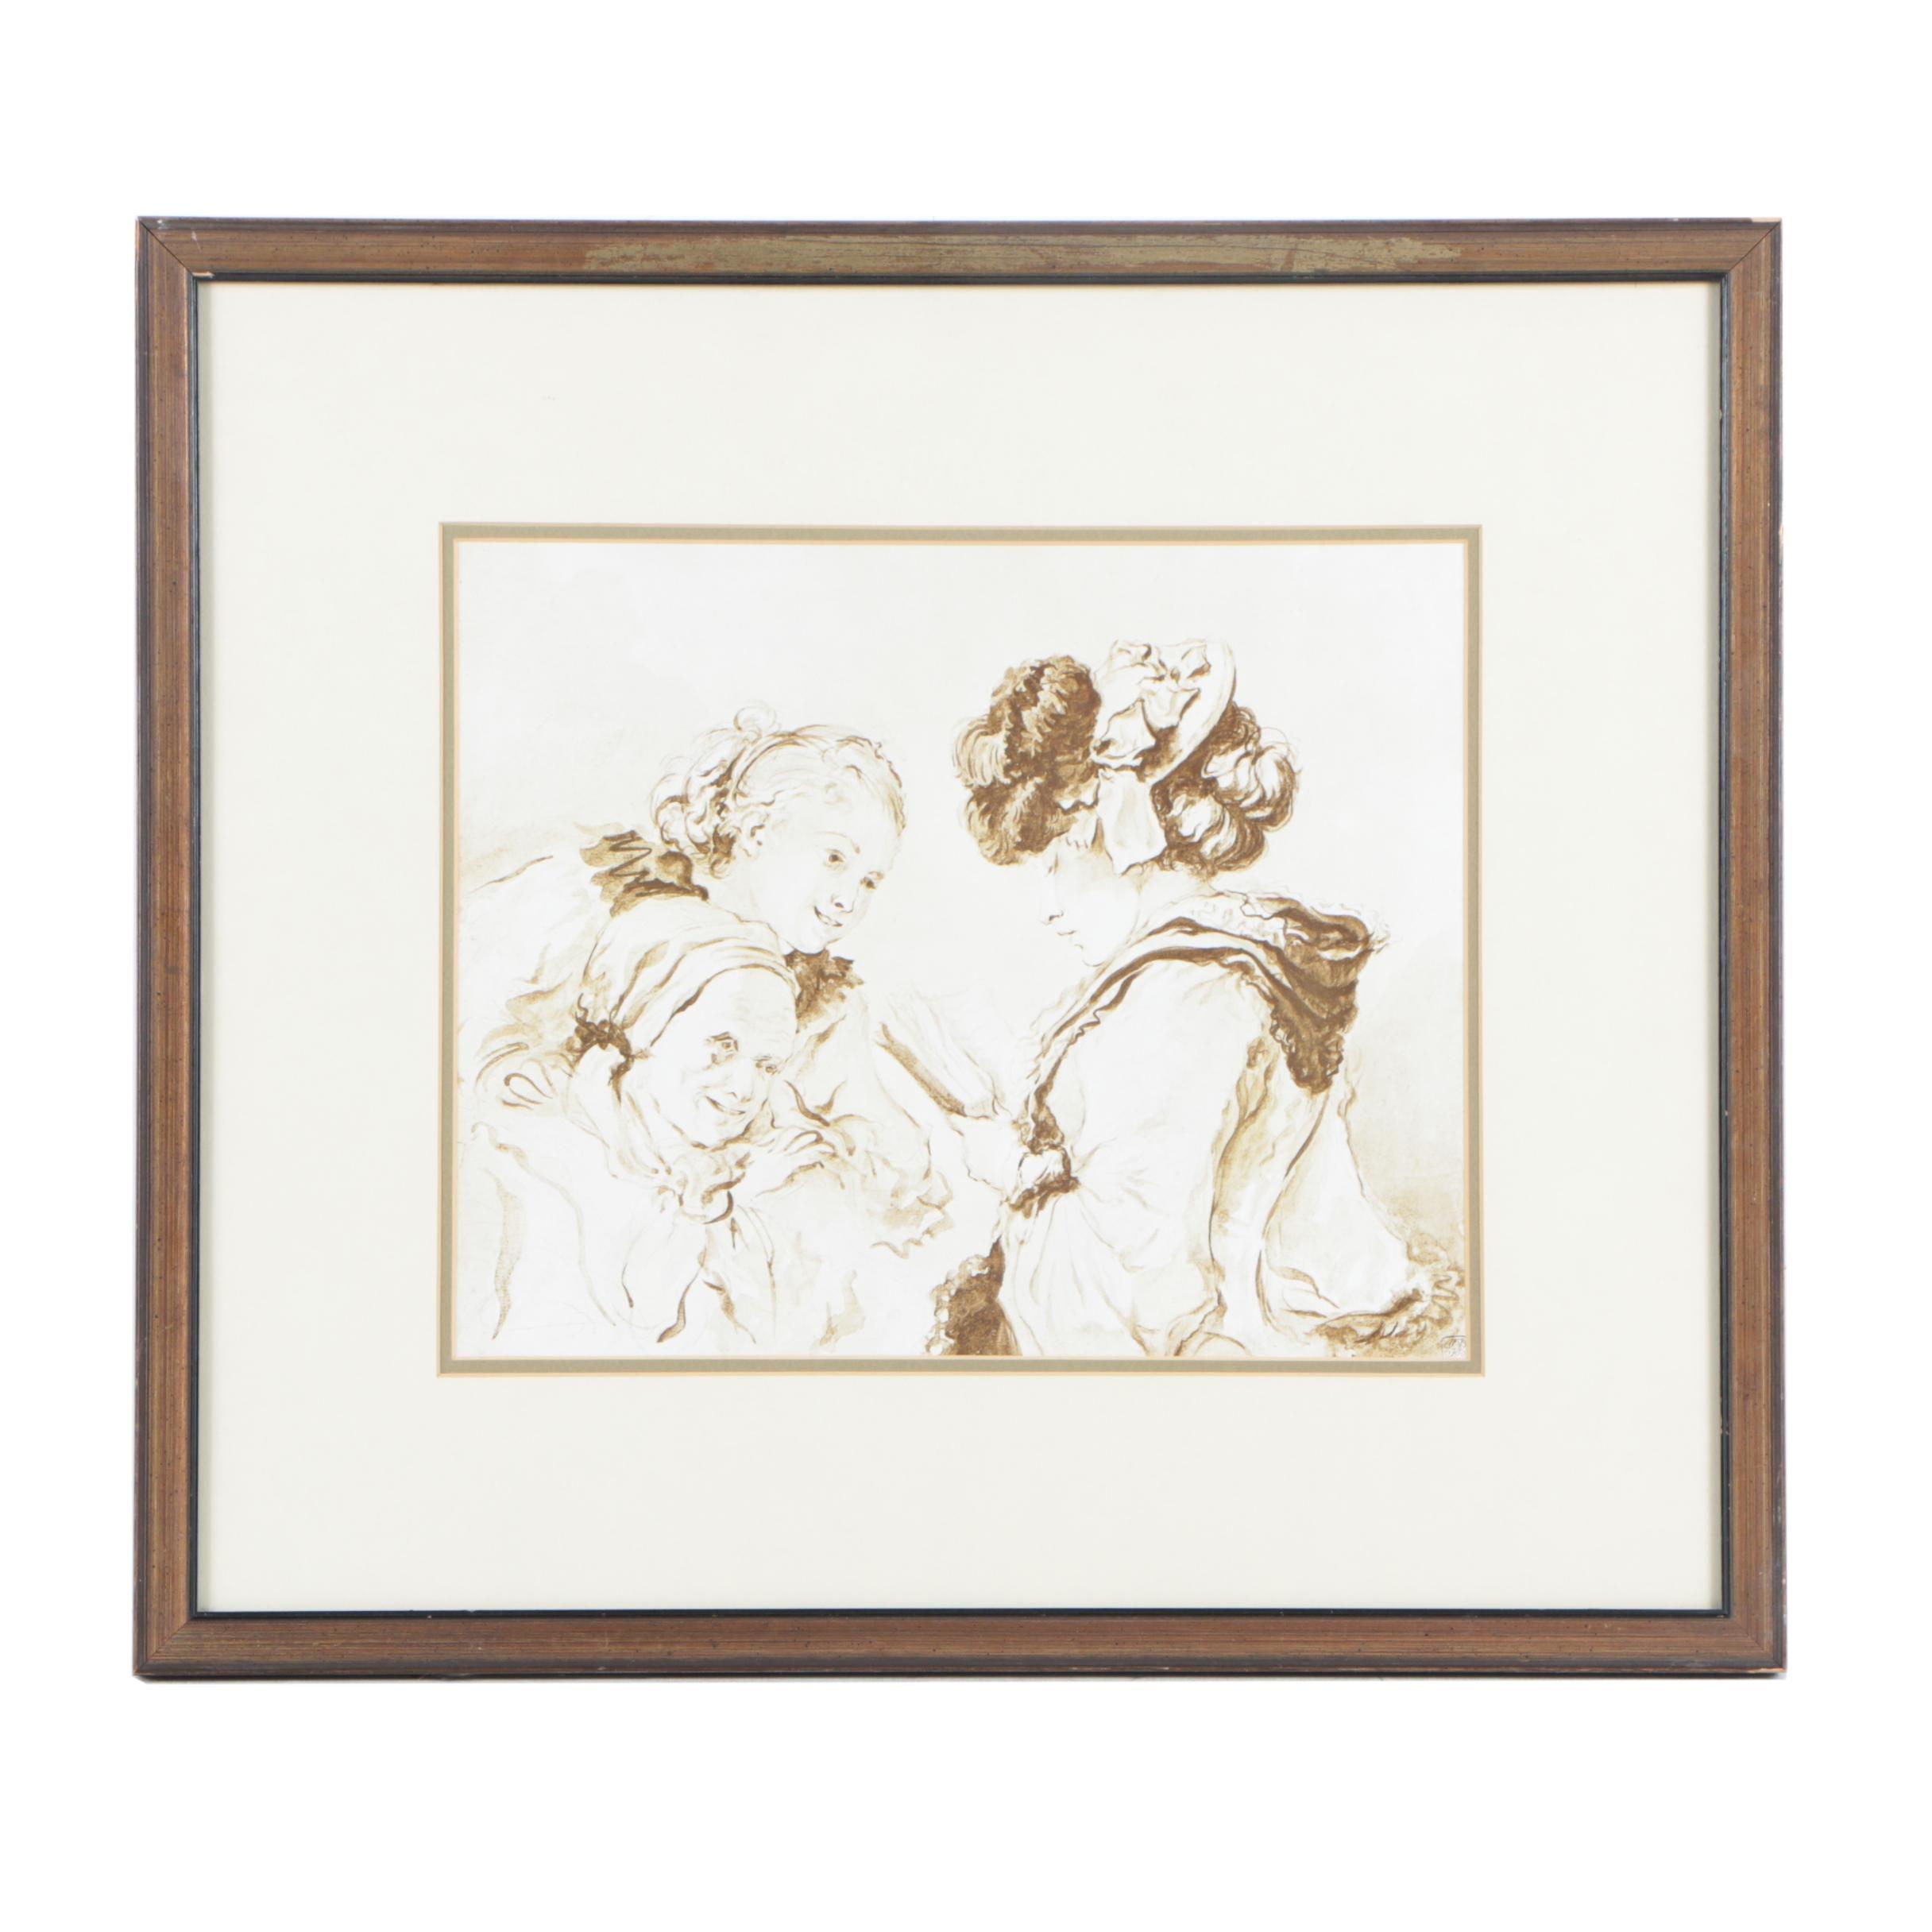 "Reproduction Print After Jean-Honore Fragonard ""La Lecture"""